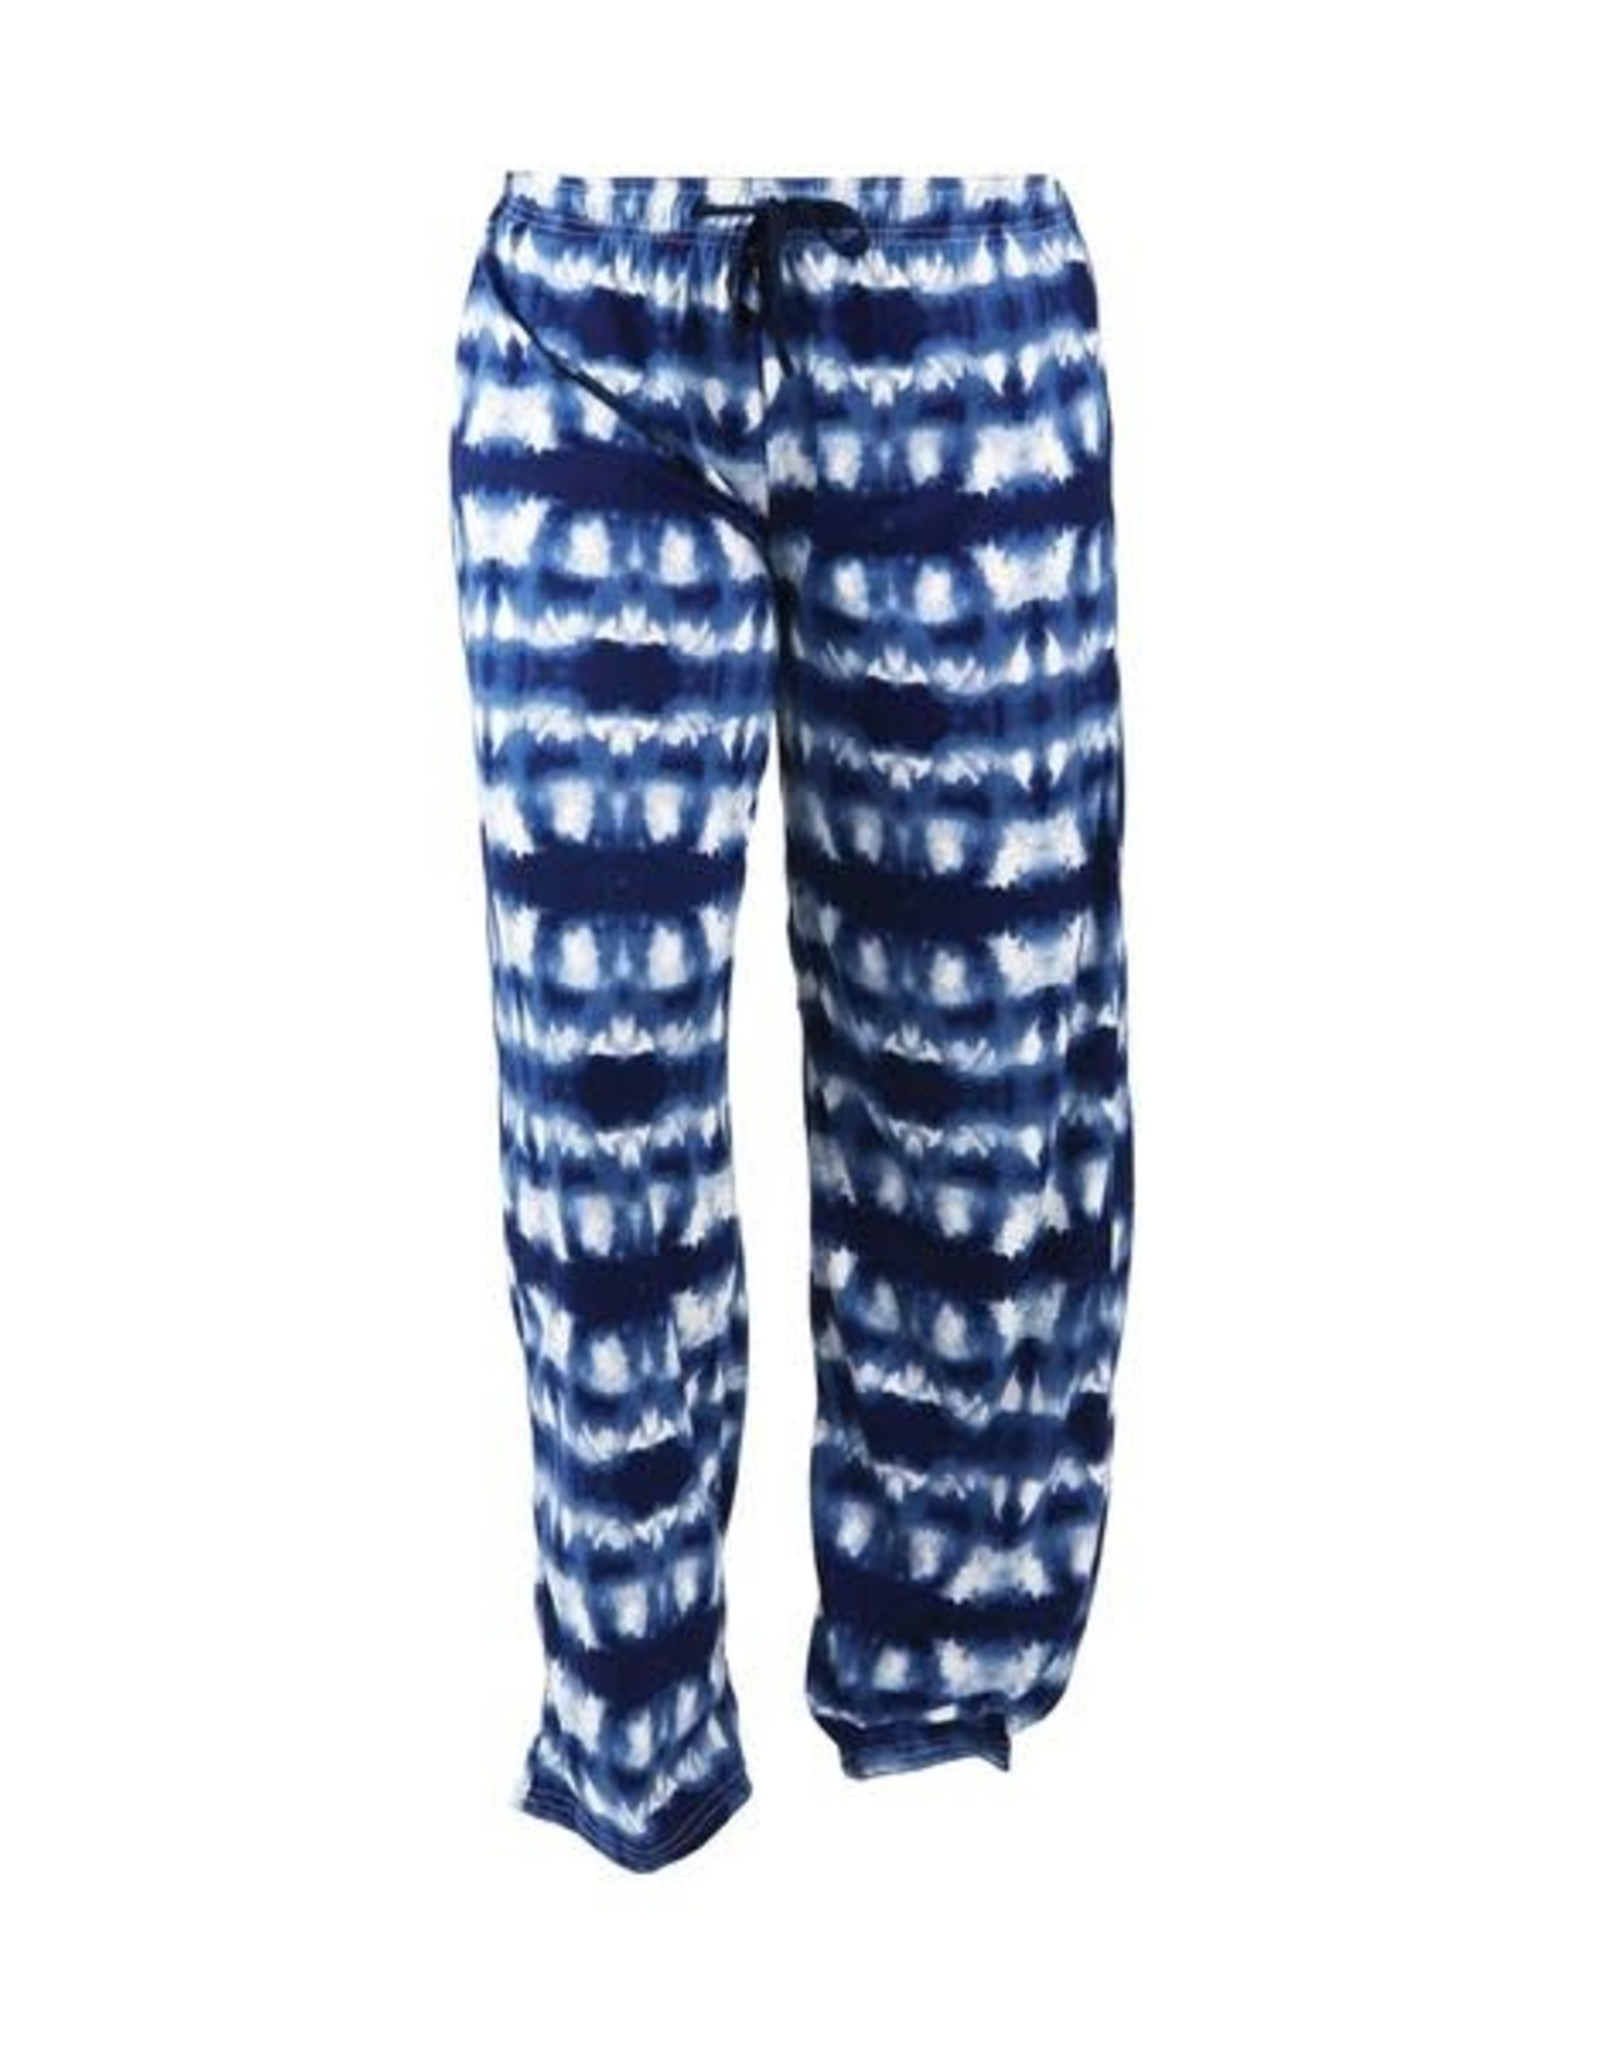 Lounge Pants - Daydream, Medium/Large